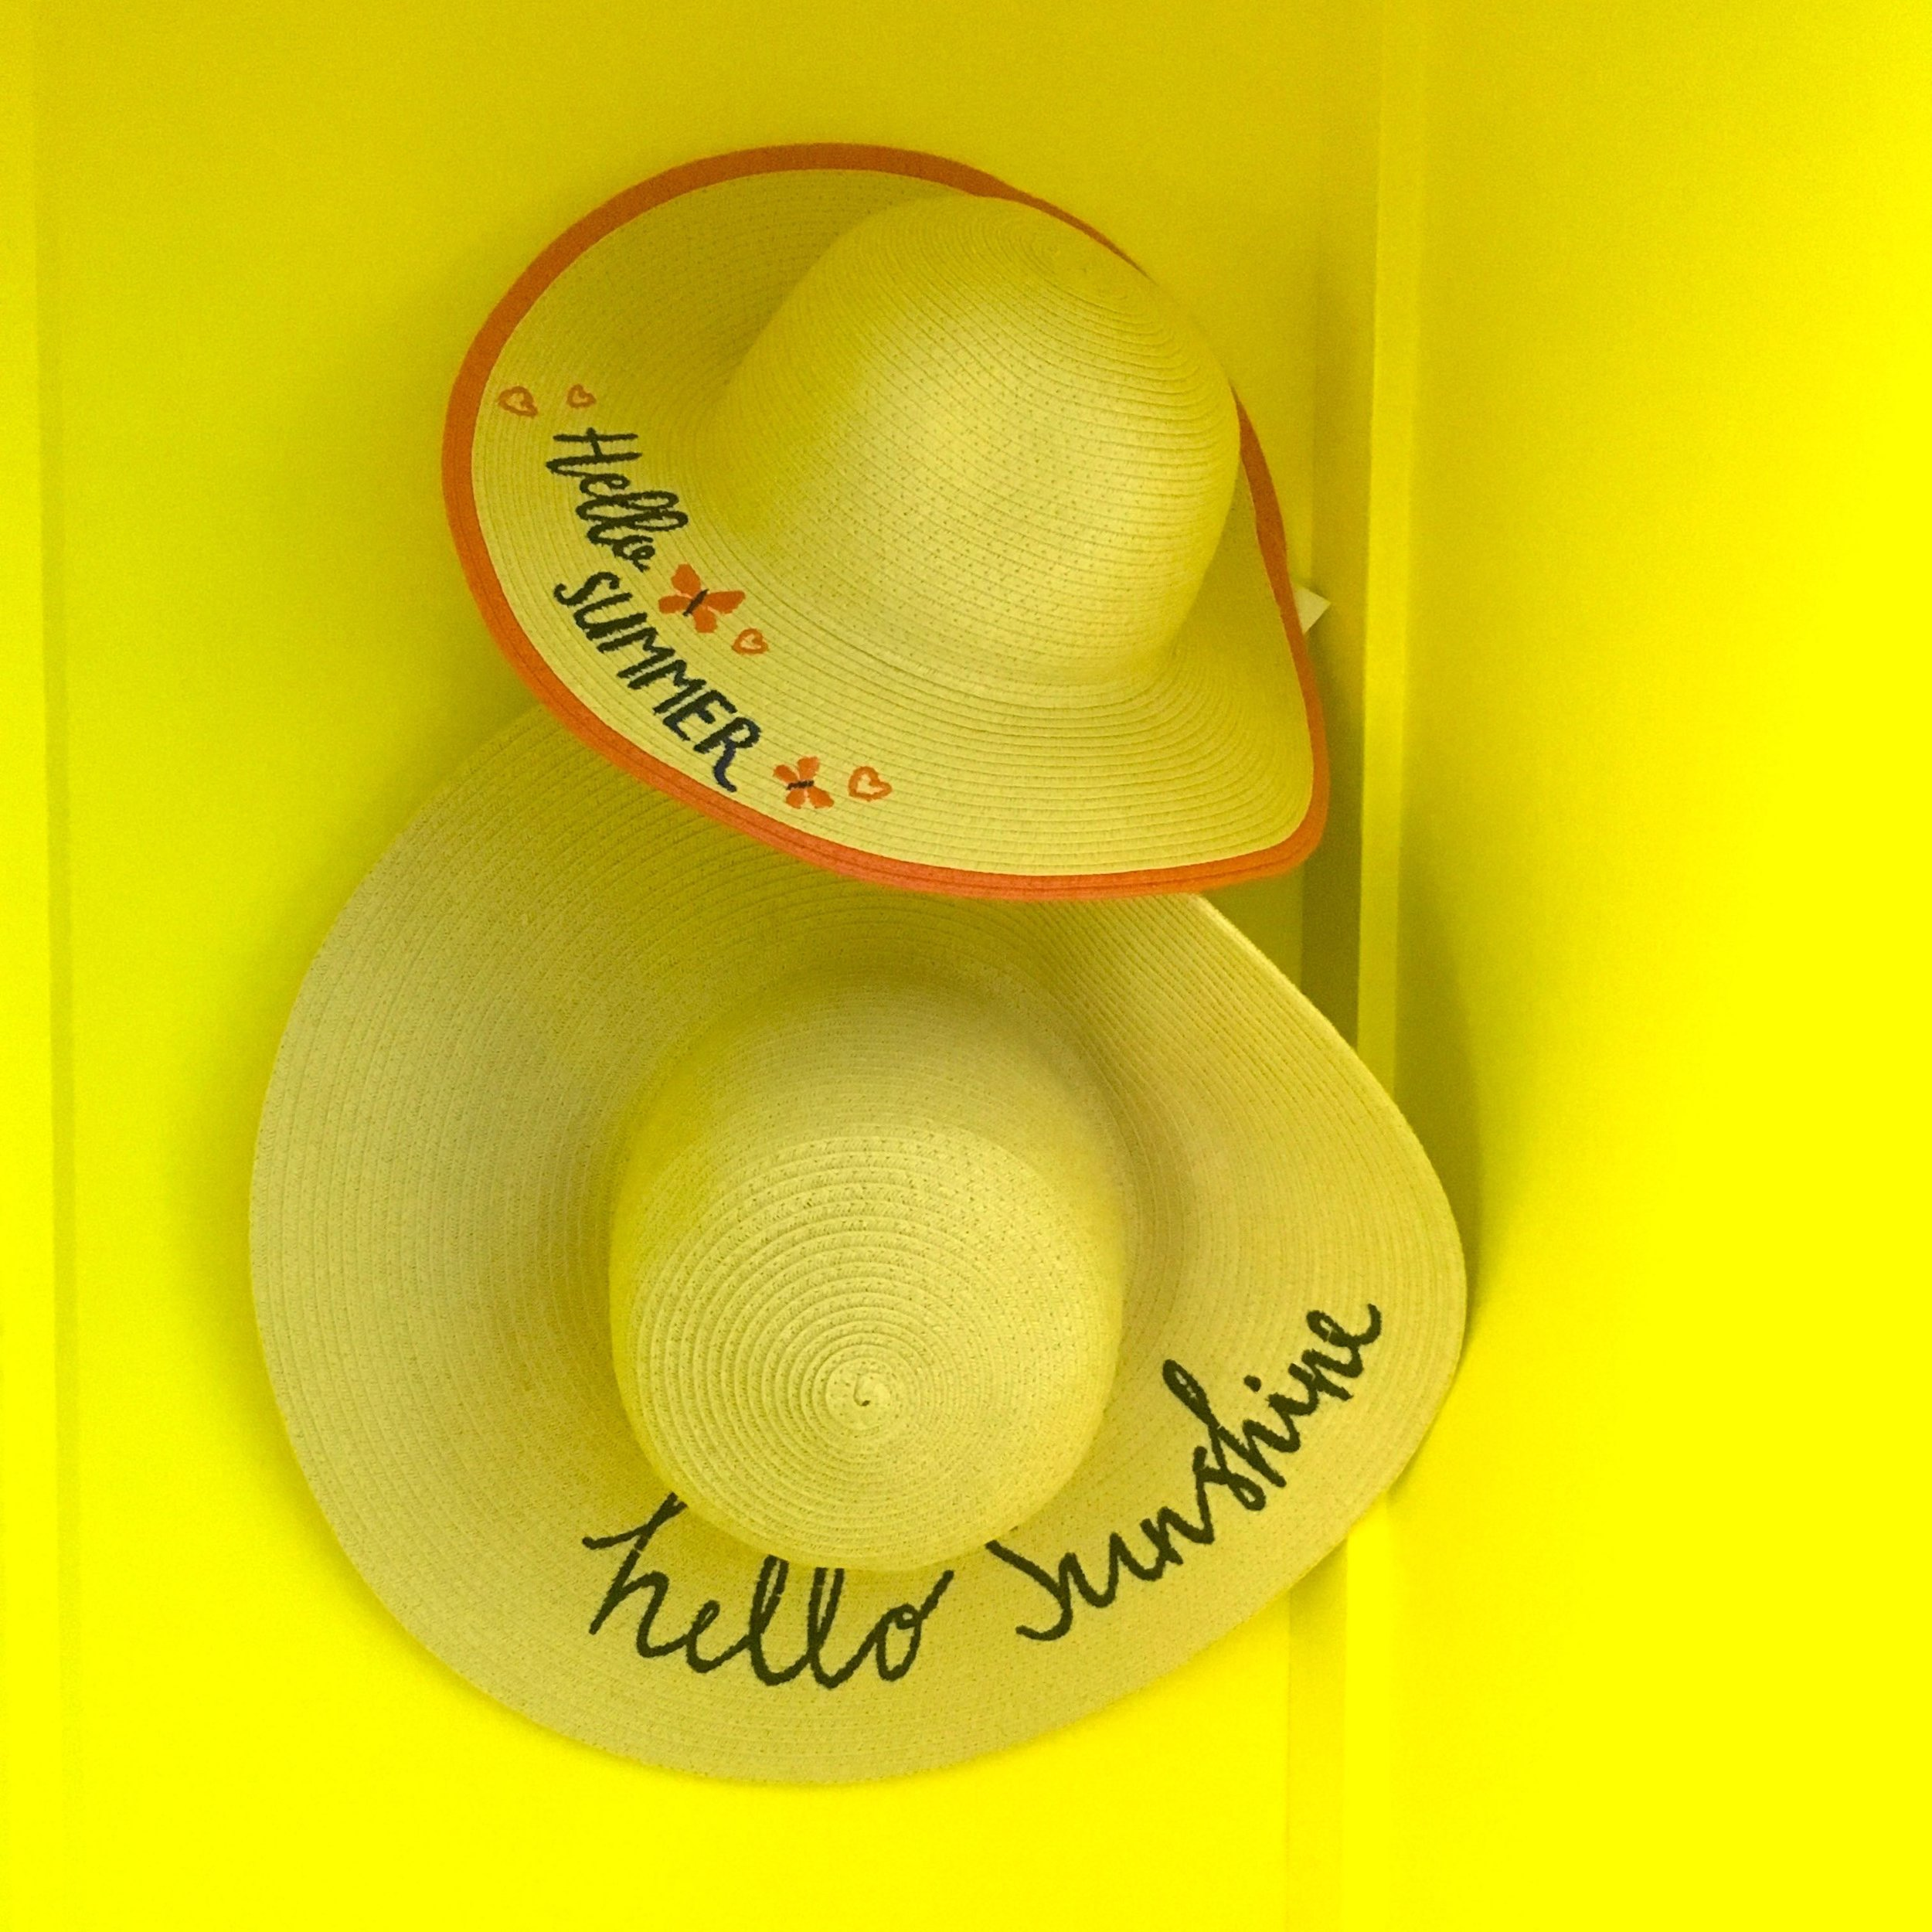 straw hats - hello sunshine, hello summer - but where's it gone?